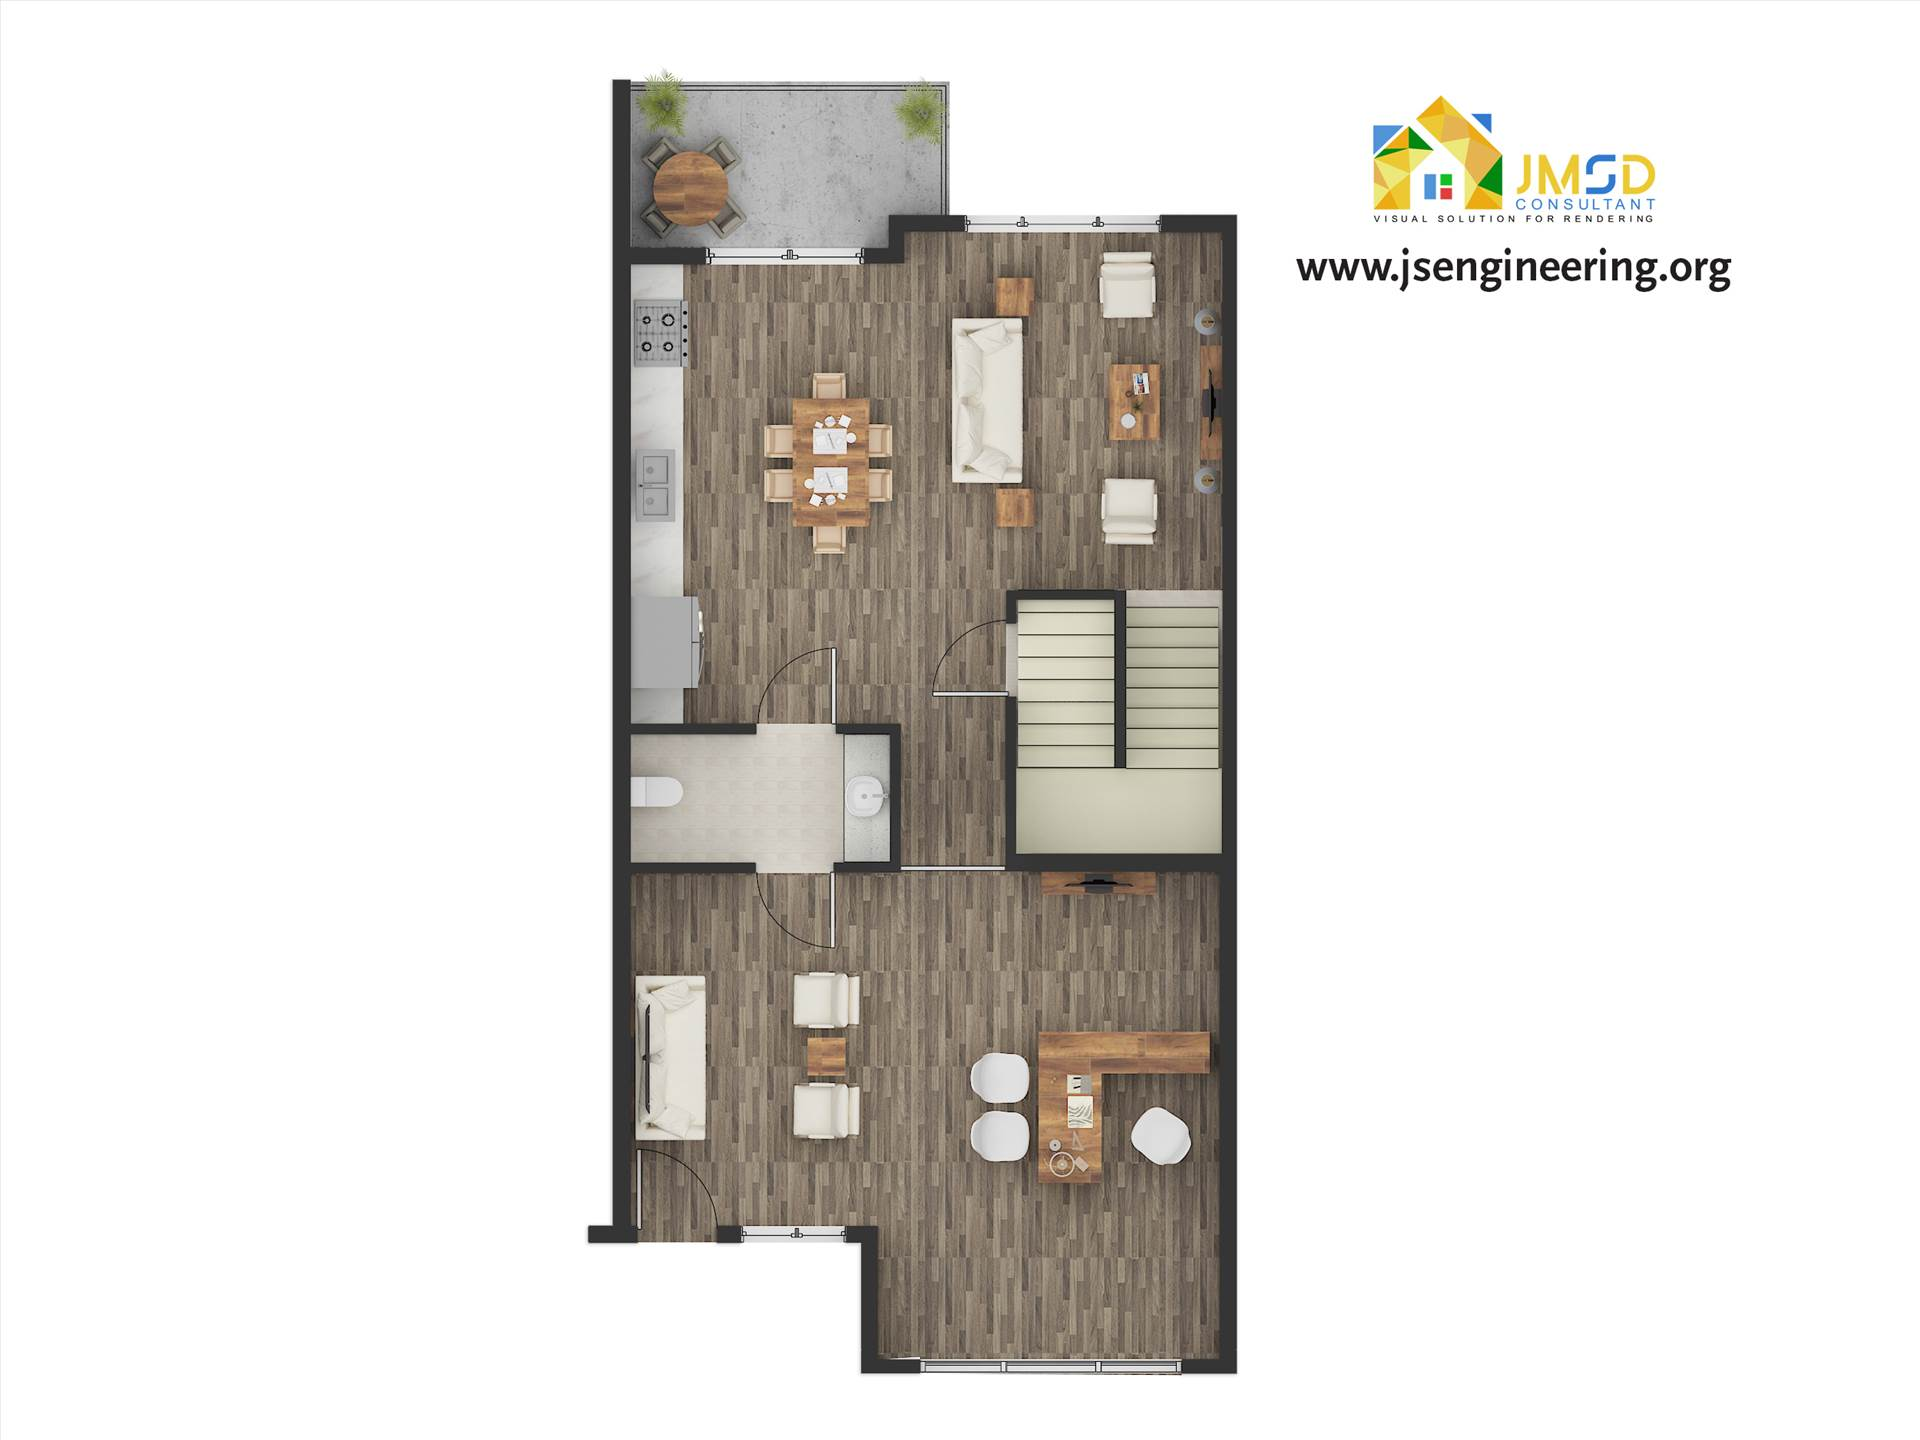 Floor Plan Rendering Services Color 2D Floor Plan Rendering for Marketing. by JMSDCONSULTANT